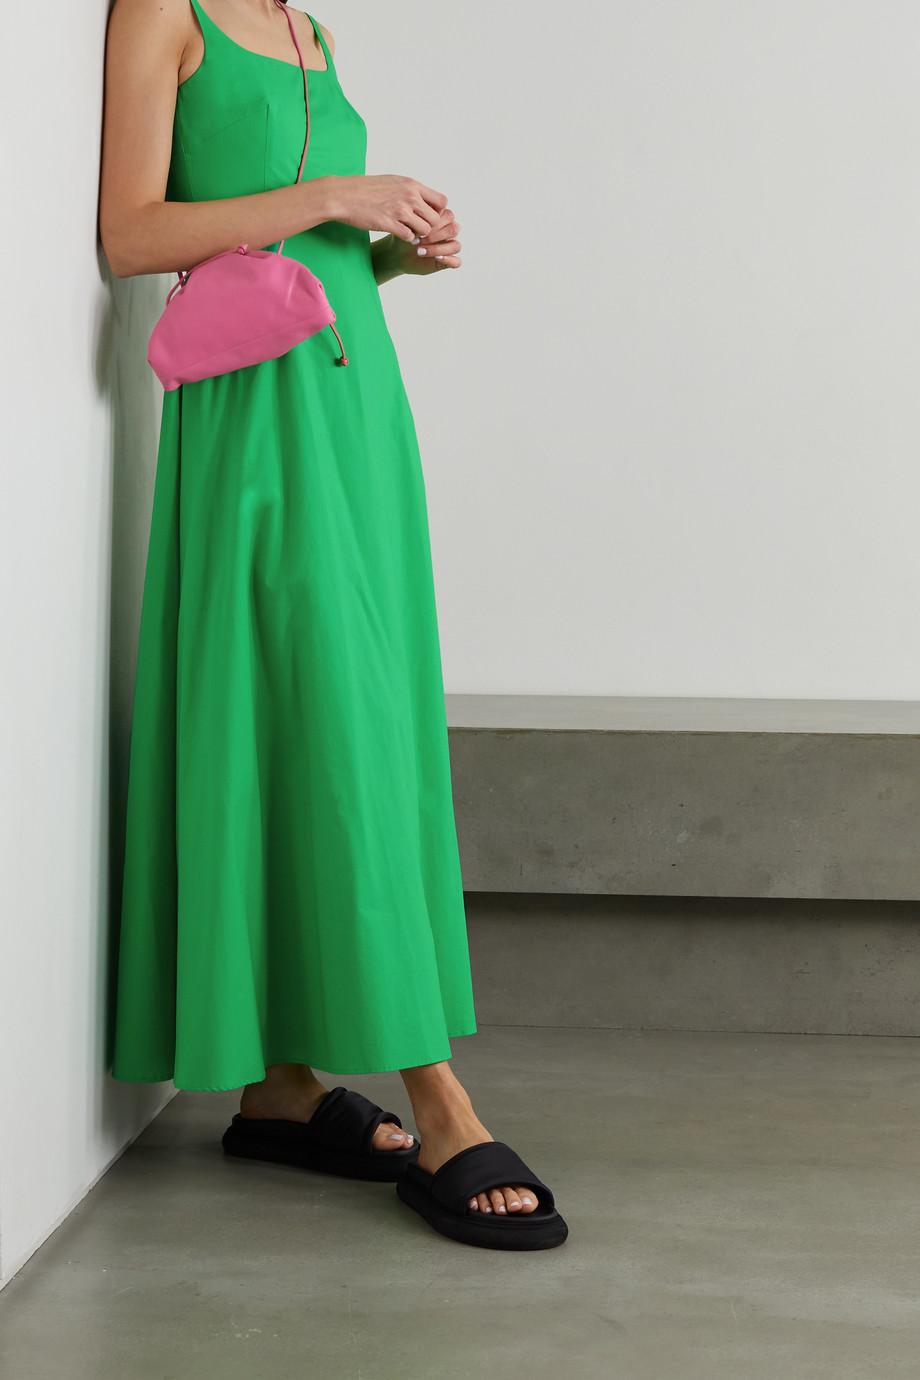 Molly Goddard Hilary cotton maxi dress